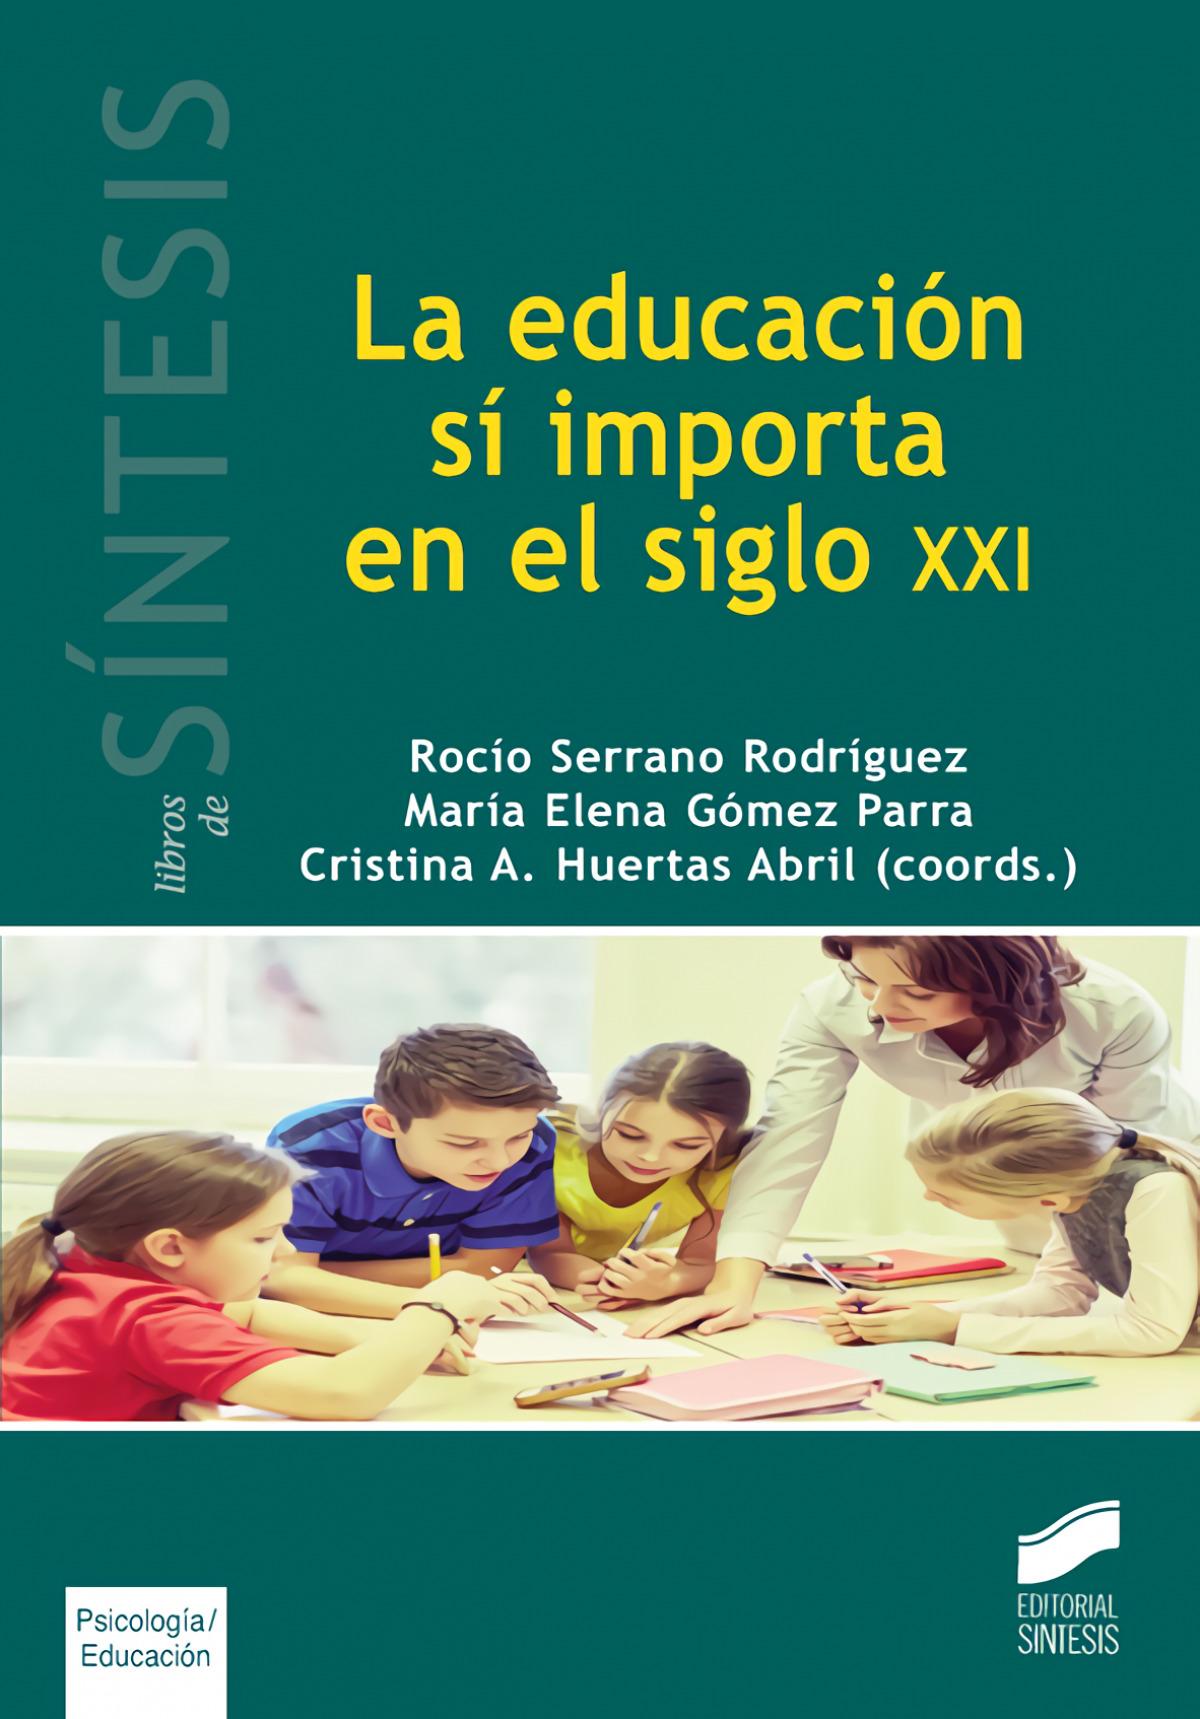 EDUCACION SI IMPORTA EN EL SIGLO XXI